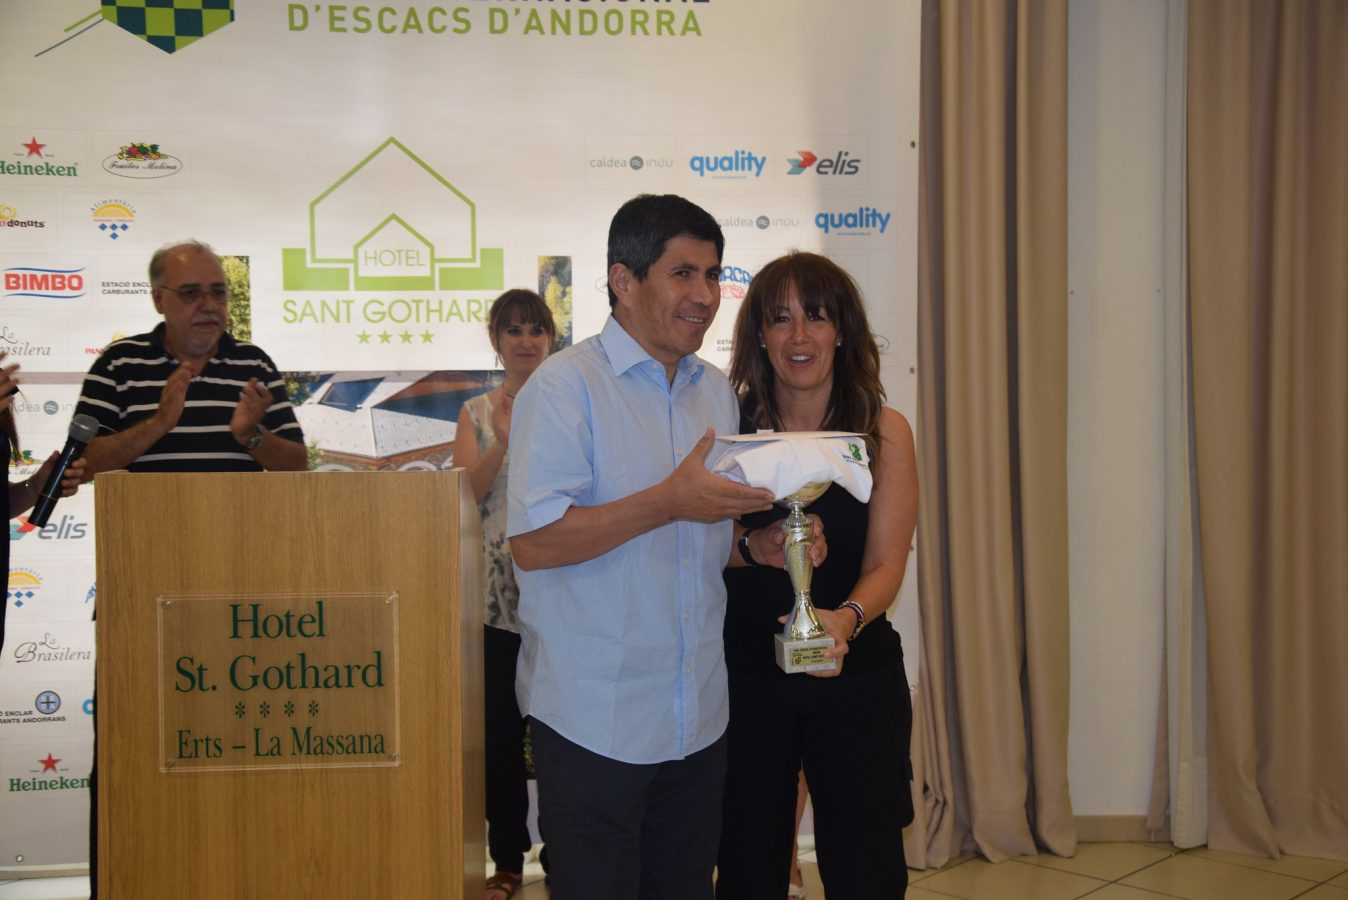 33 Open Andorra Hotel St. Gothard – R9